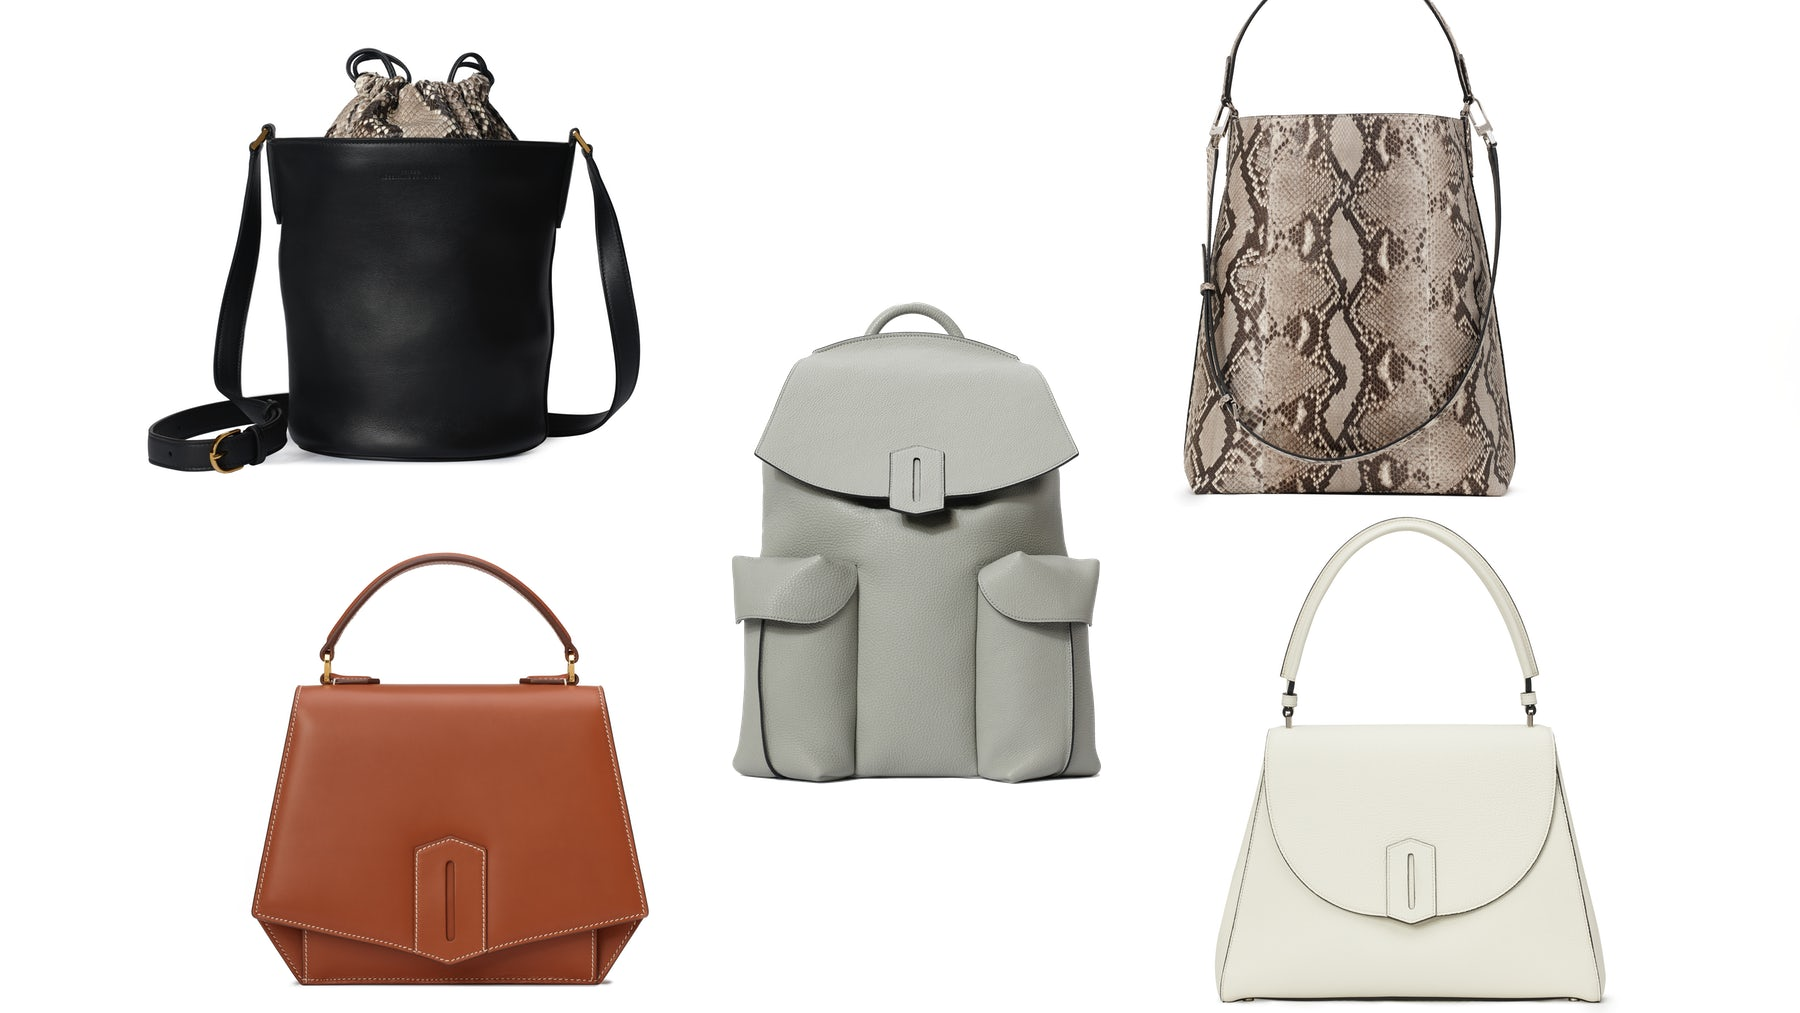 Byredo's new handbag line | Source: Courtesy